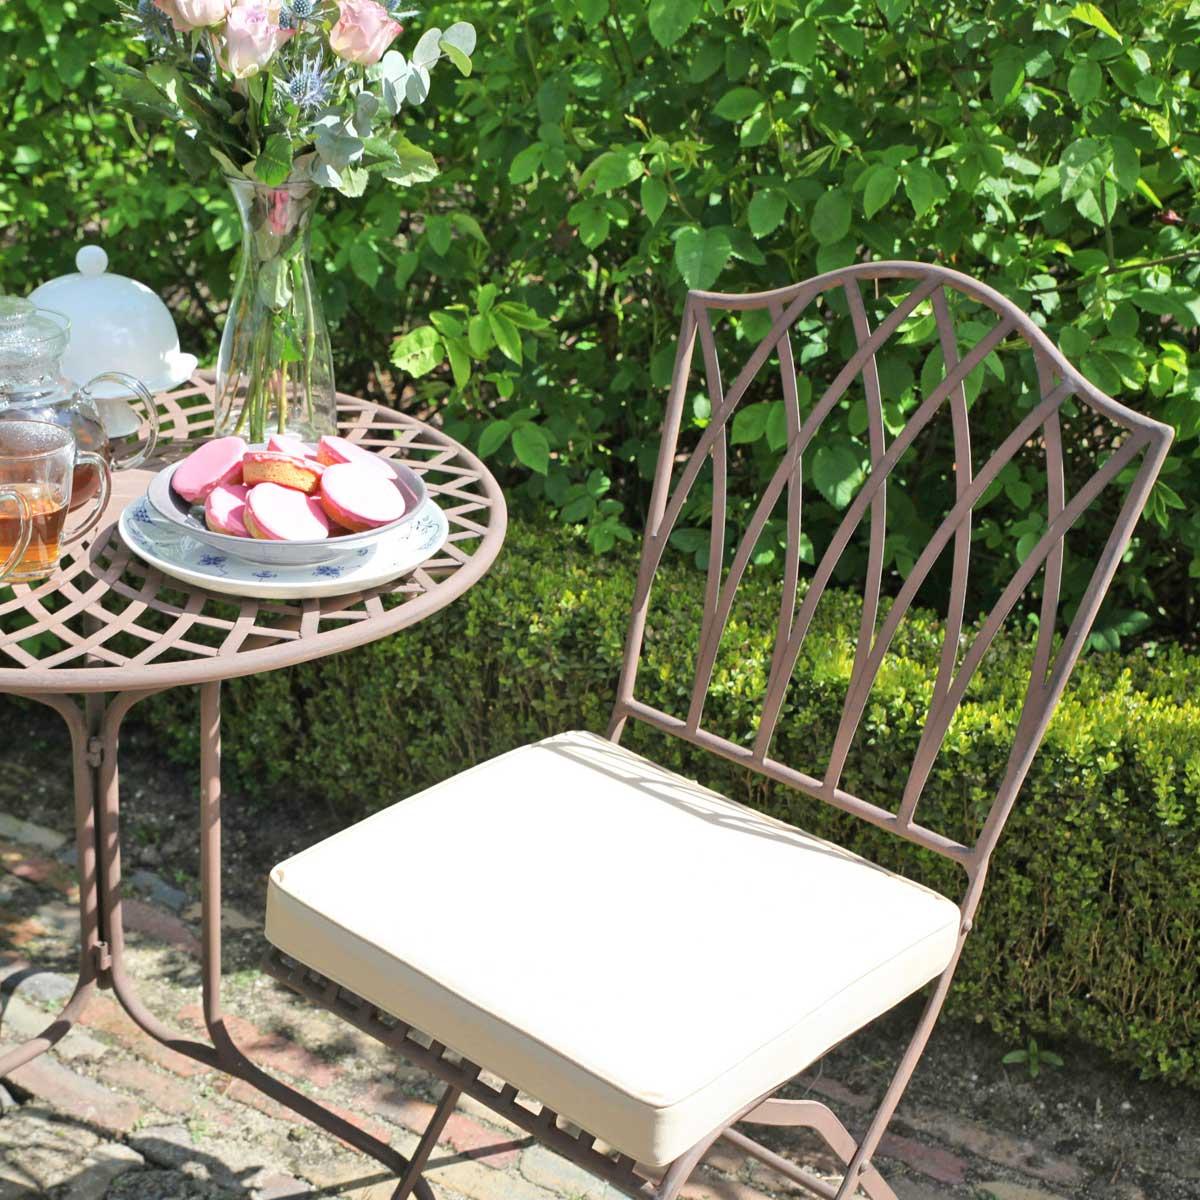 Salon De Jardin Sophia En Acier Style Fer Forgé concernant Salon De Jardin En Fer Forgé